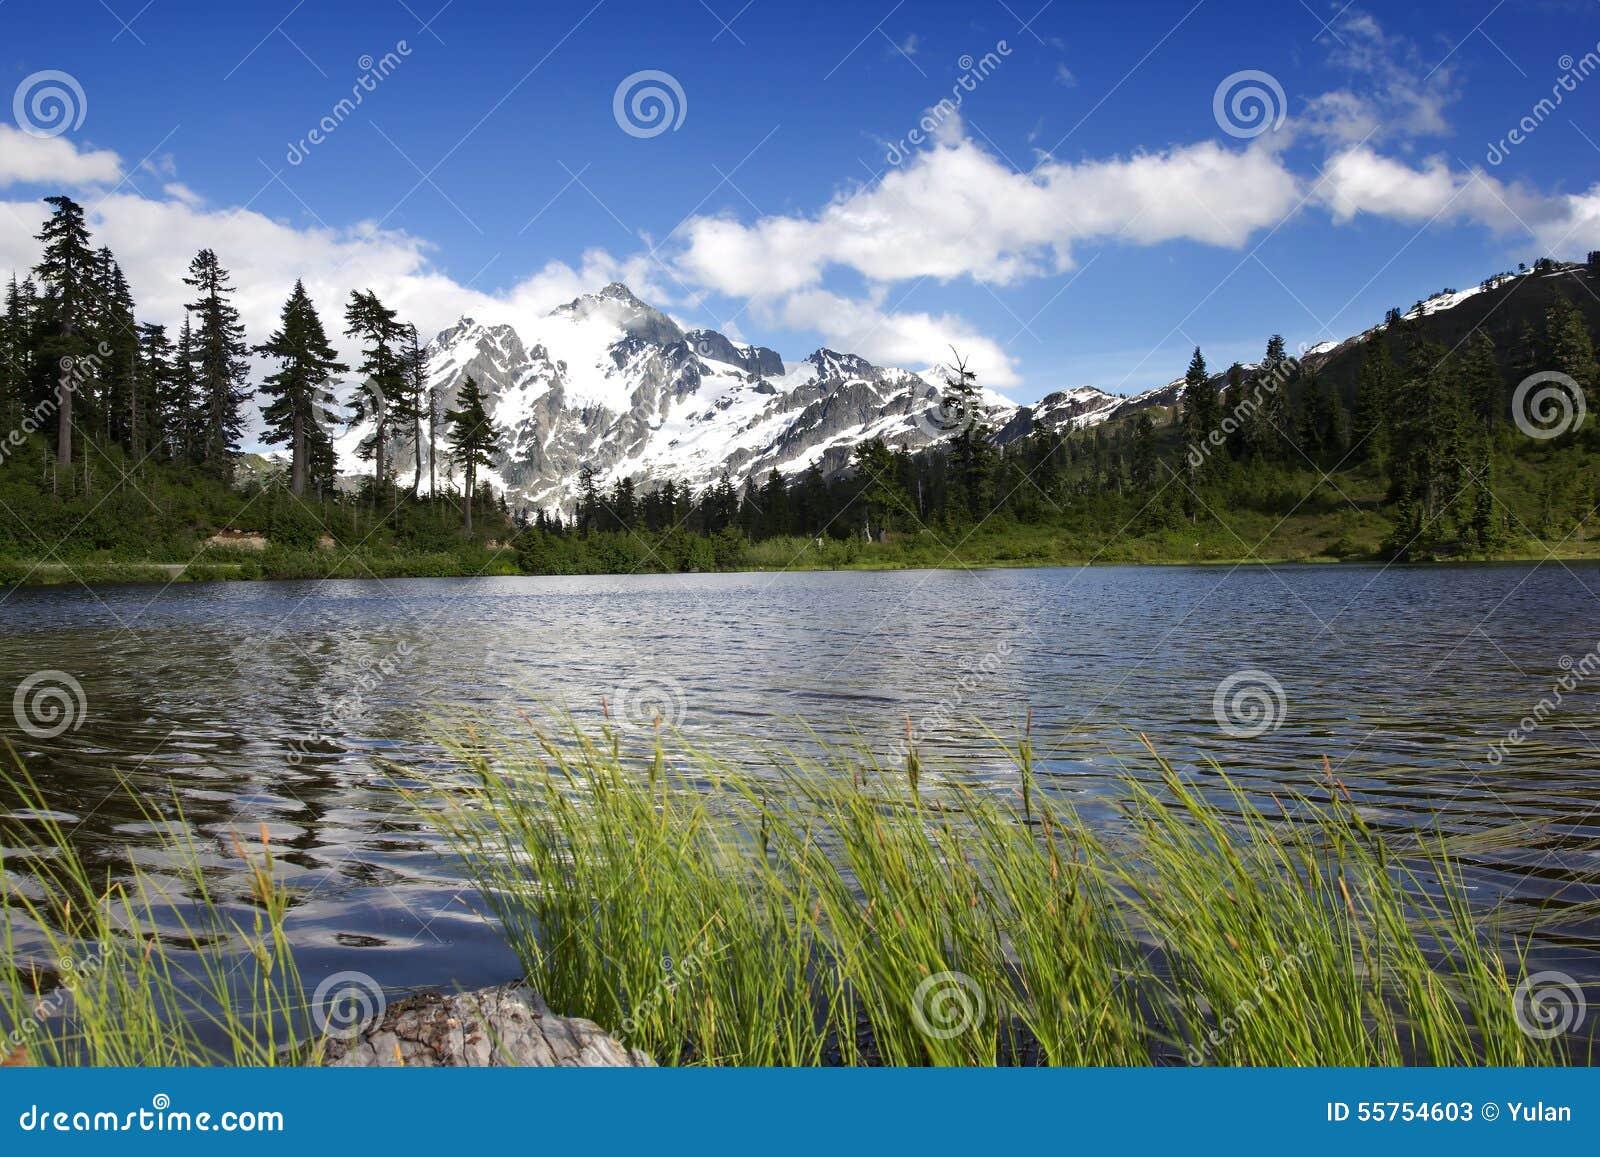 Berg Shuksan und Picture See